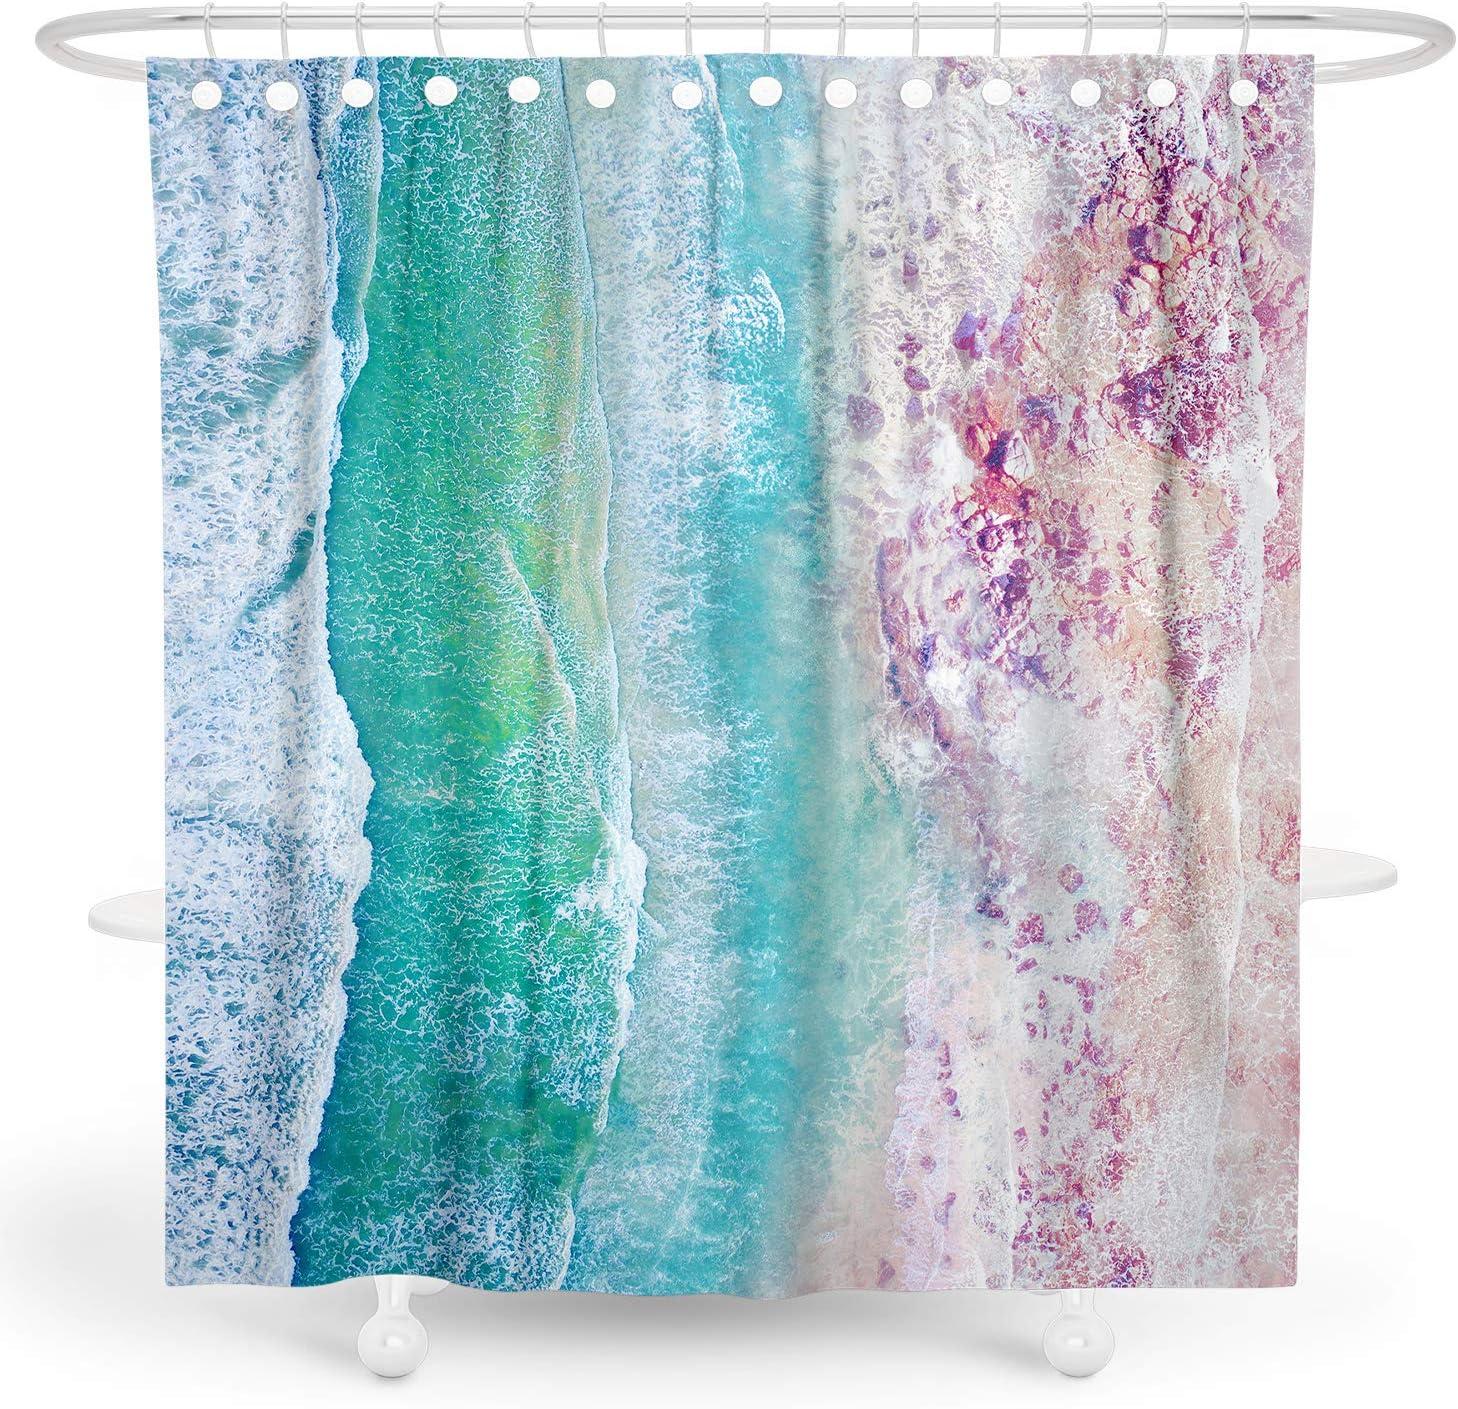 Summer Sea Beach Surfing Board Creative Fabric Shower Curtain Set Bathroom Decor